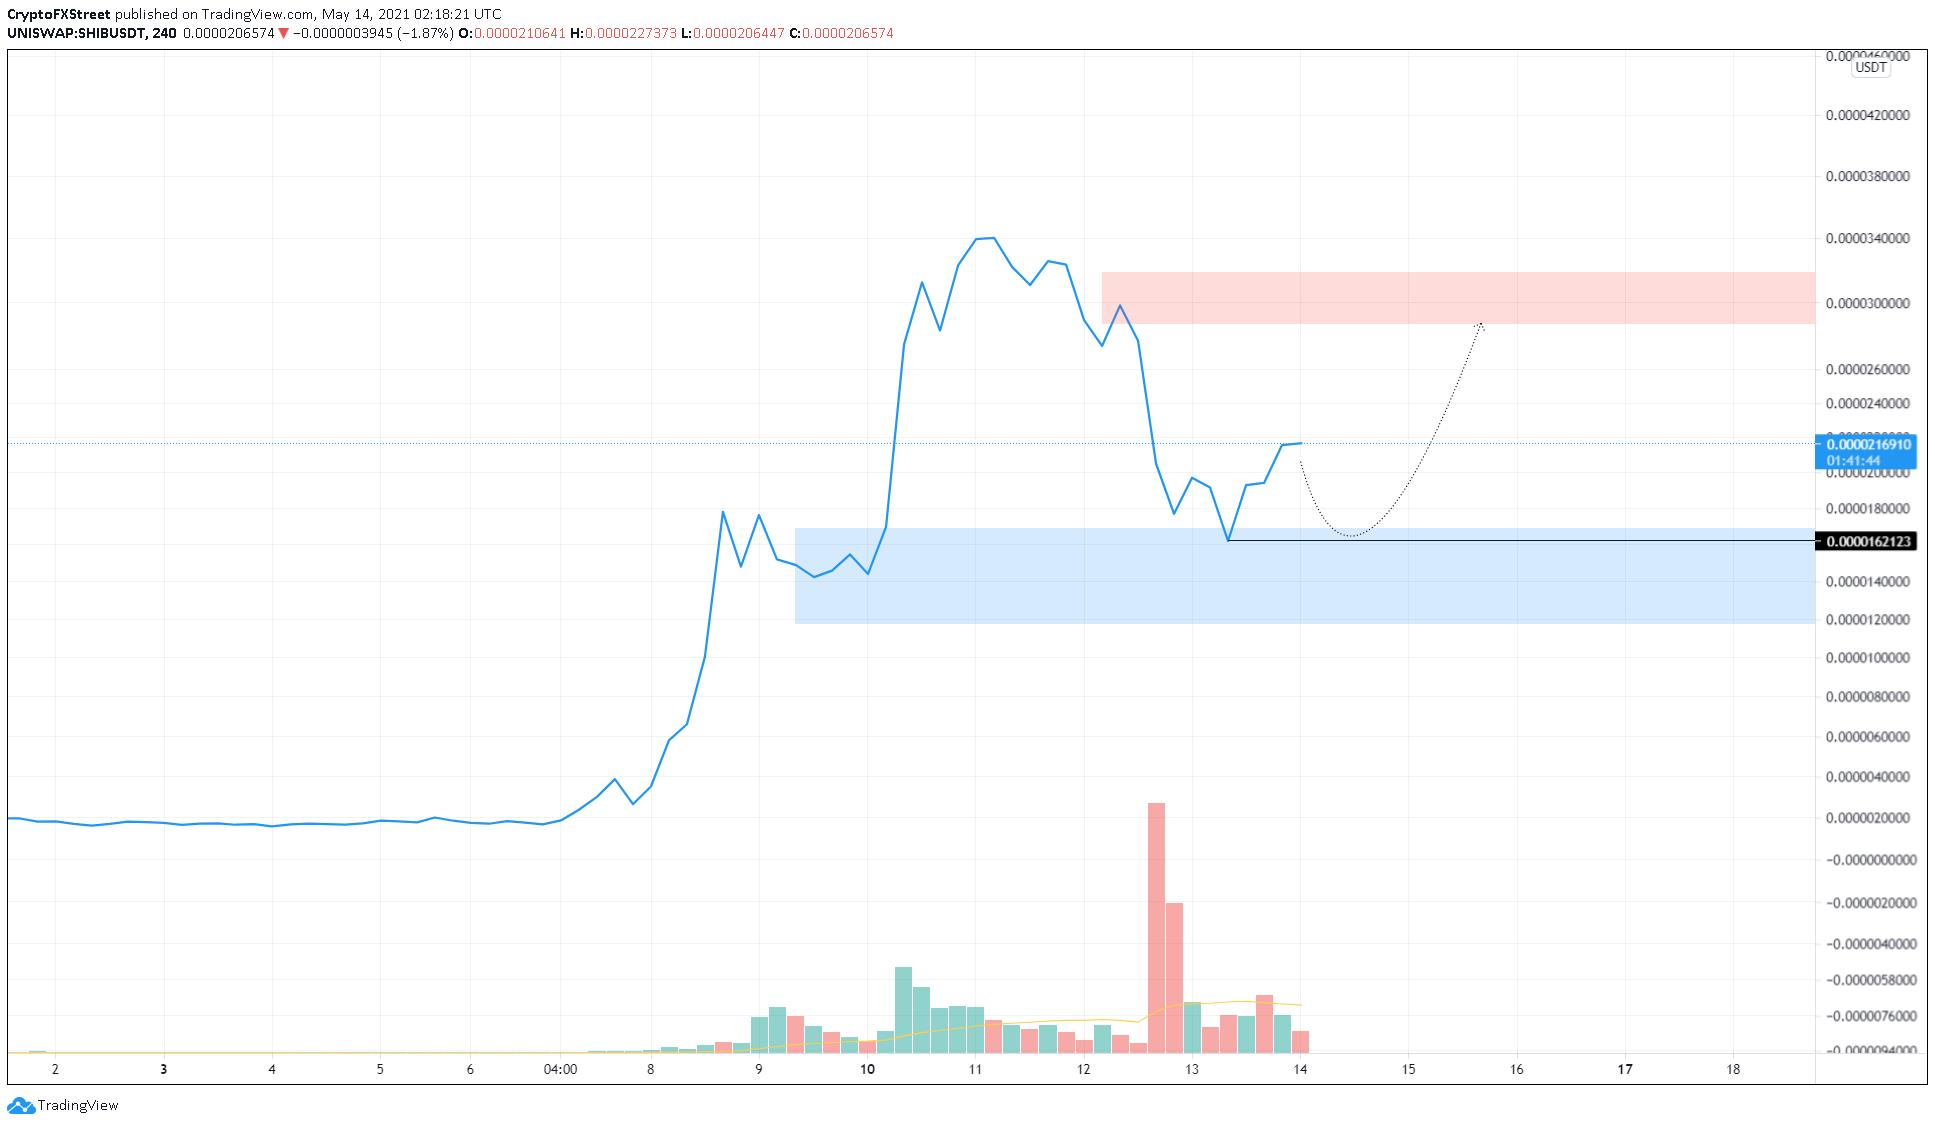 SHIB/USDT 4-hour chart